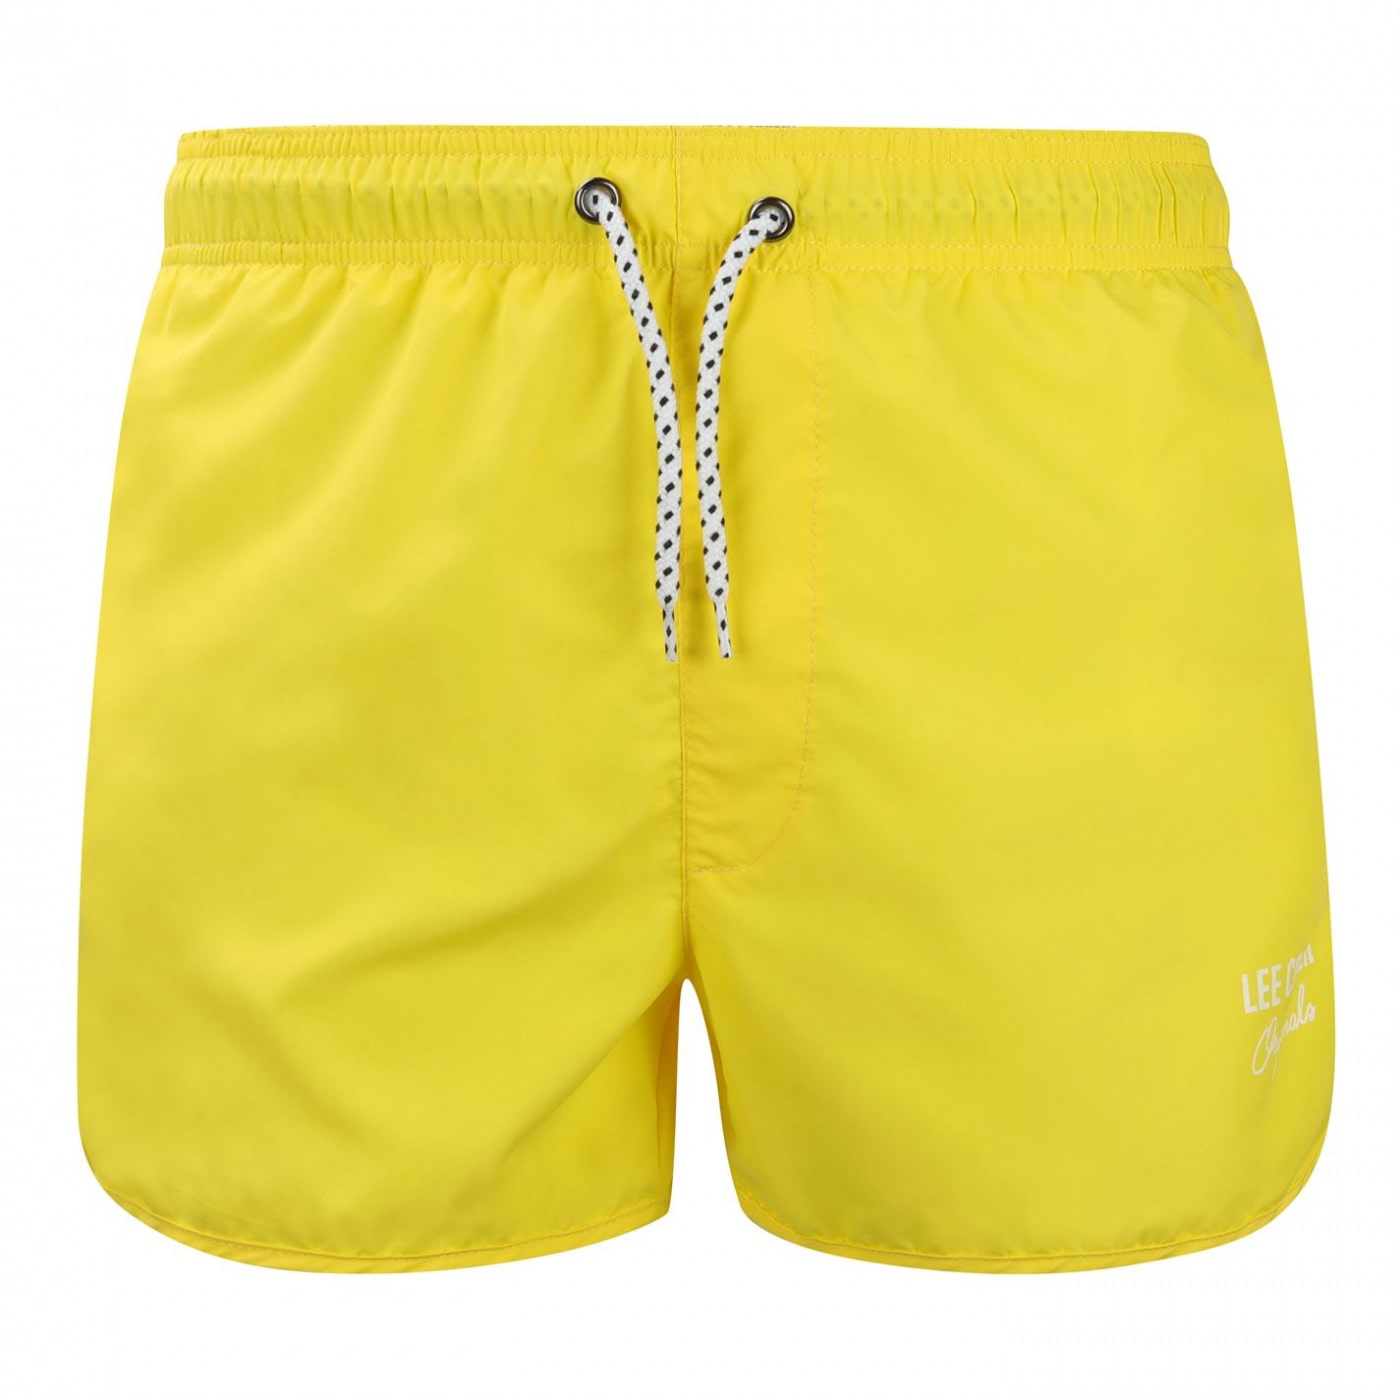 Lee Cooper Swim Shorts Mens